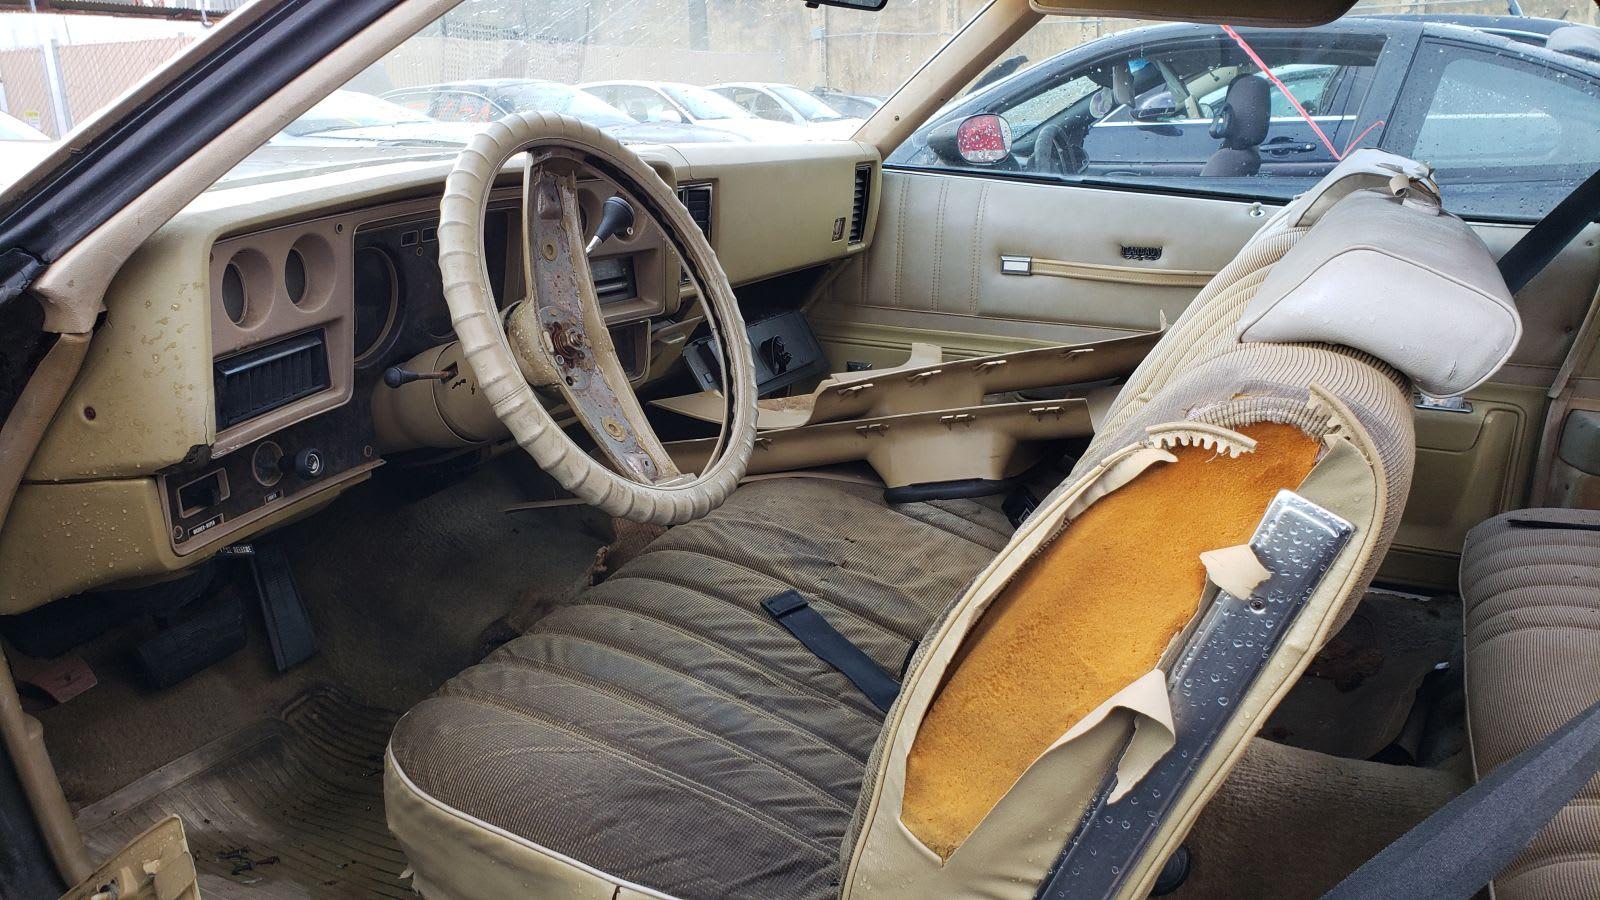 Junked 1975 Chevrolet Monte Carlo Landau